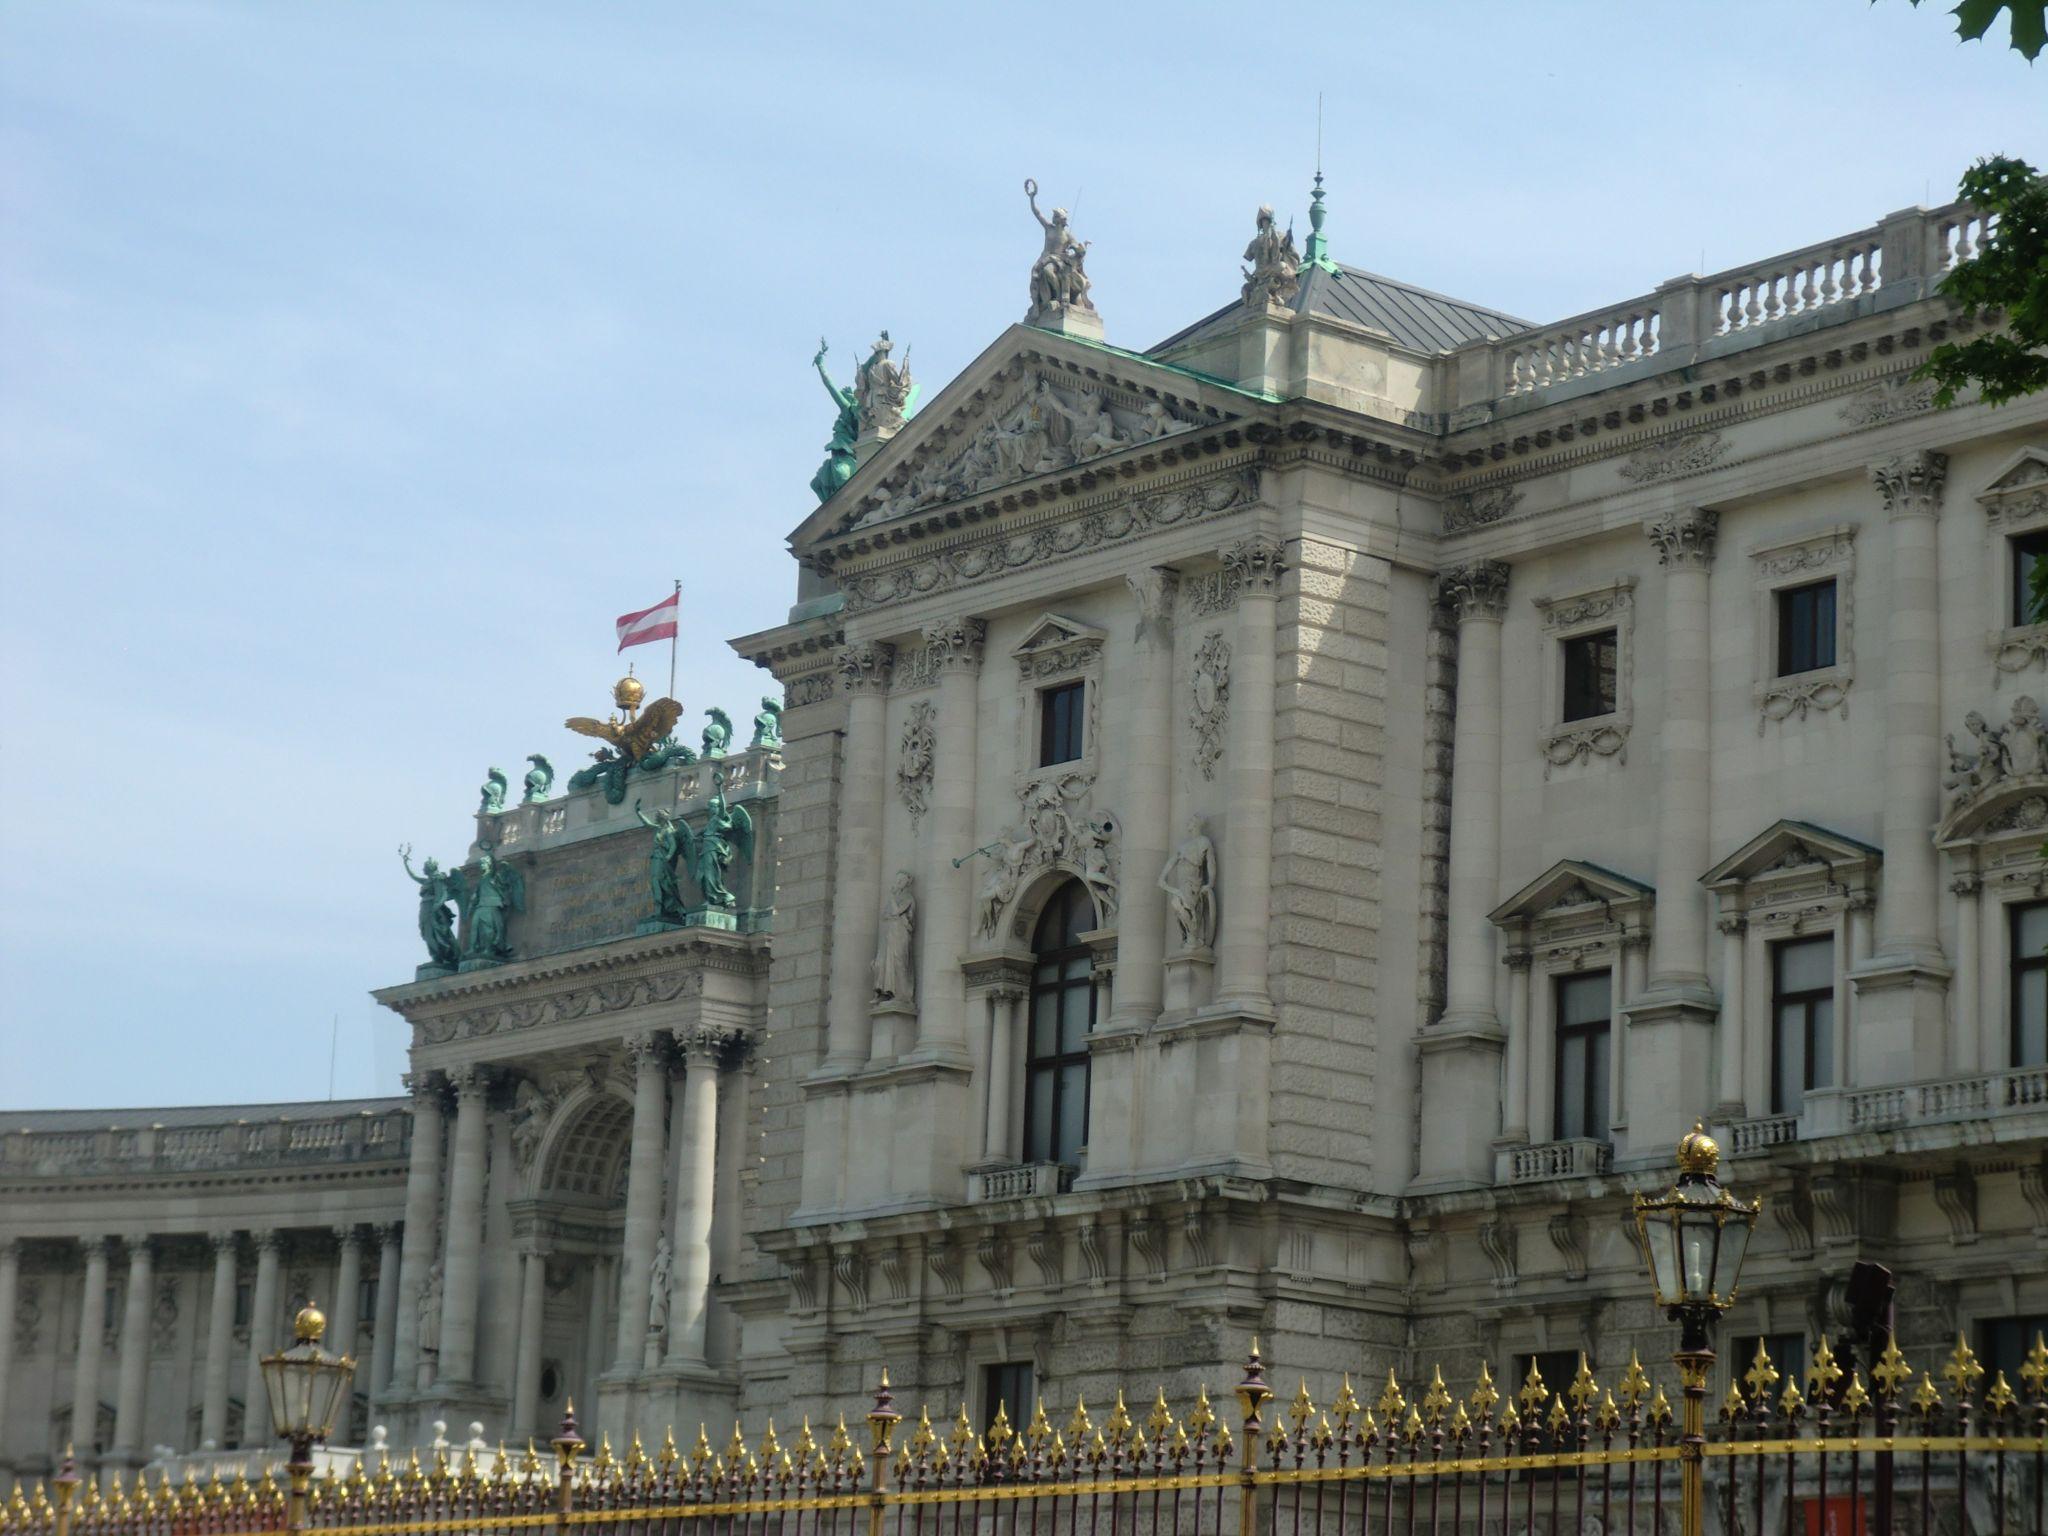 Vienna Hofburg 10 1440x1080 - Vienna: elegant beauty